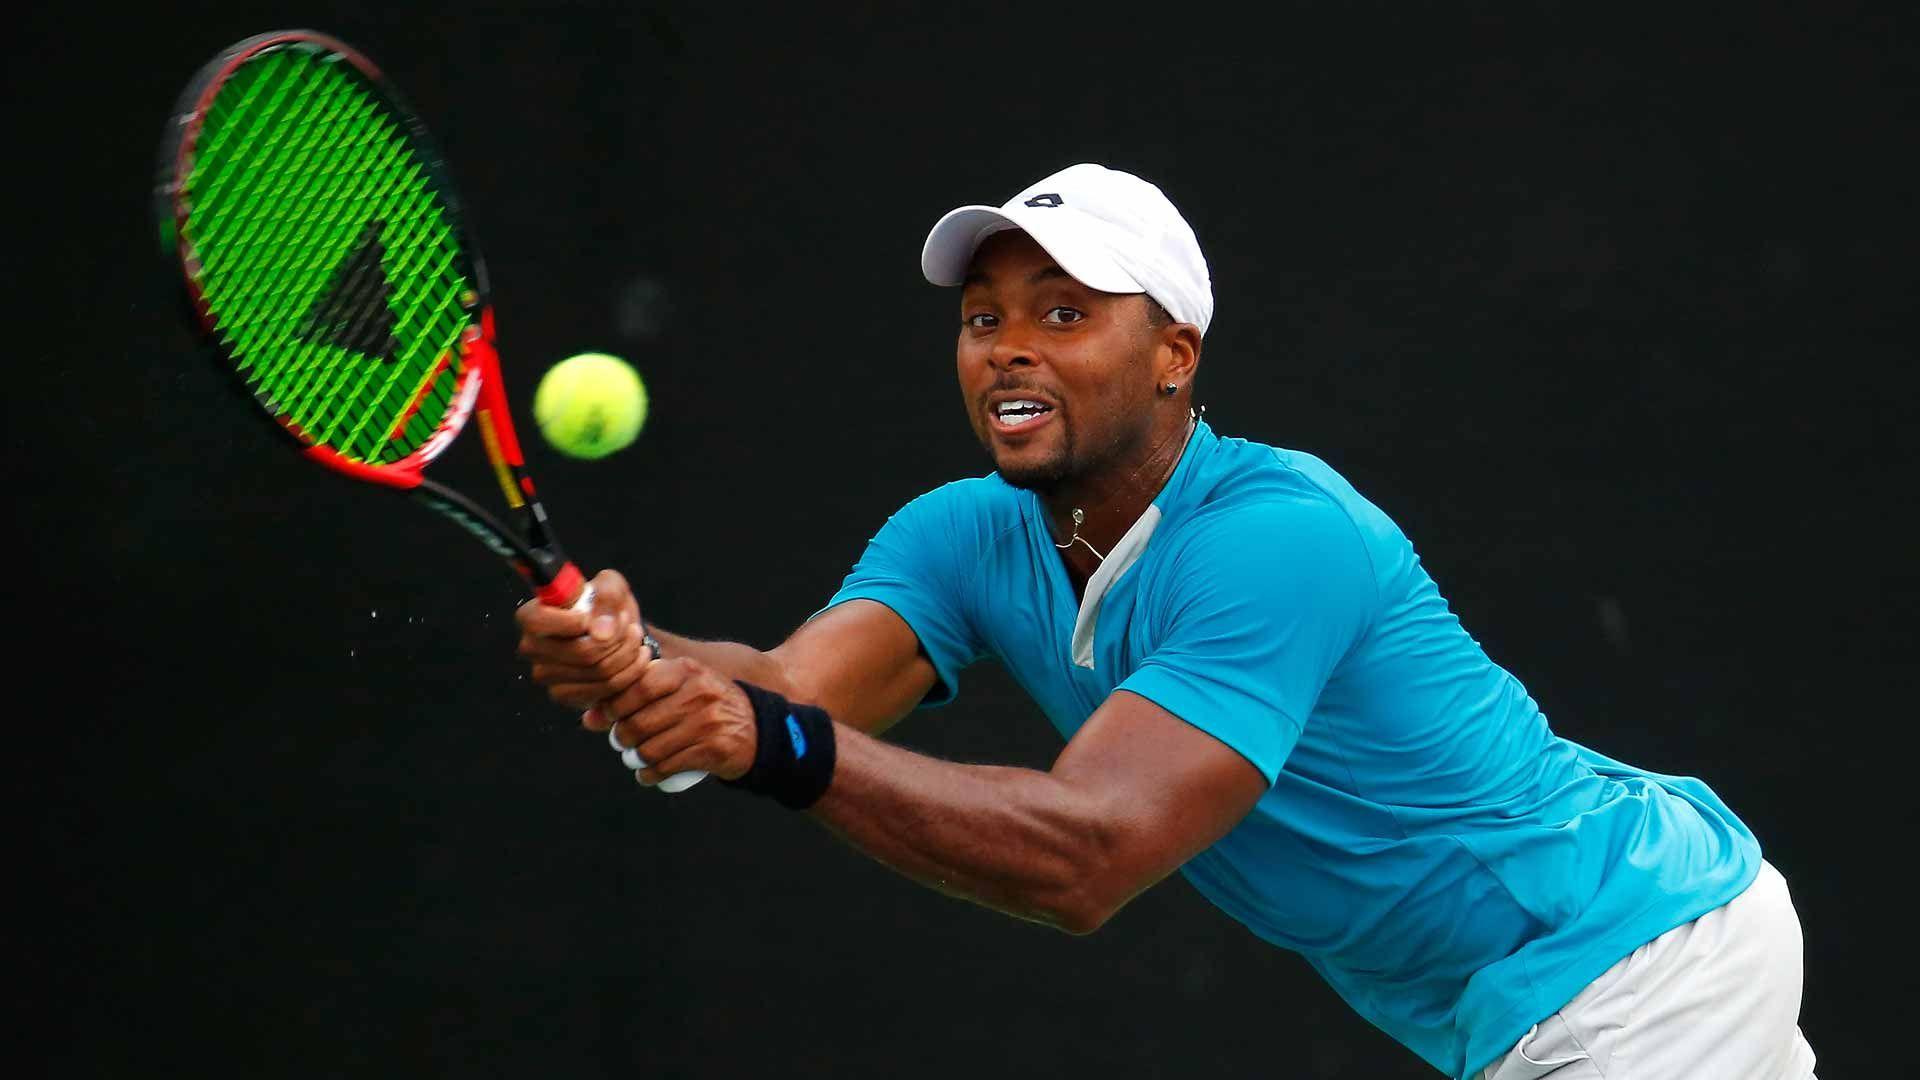 ATP World Tour Tennis montreal2015wednesdayyoung